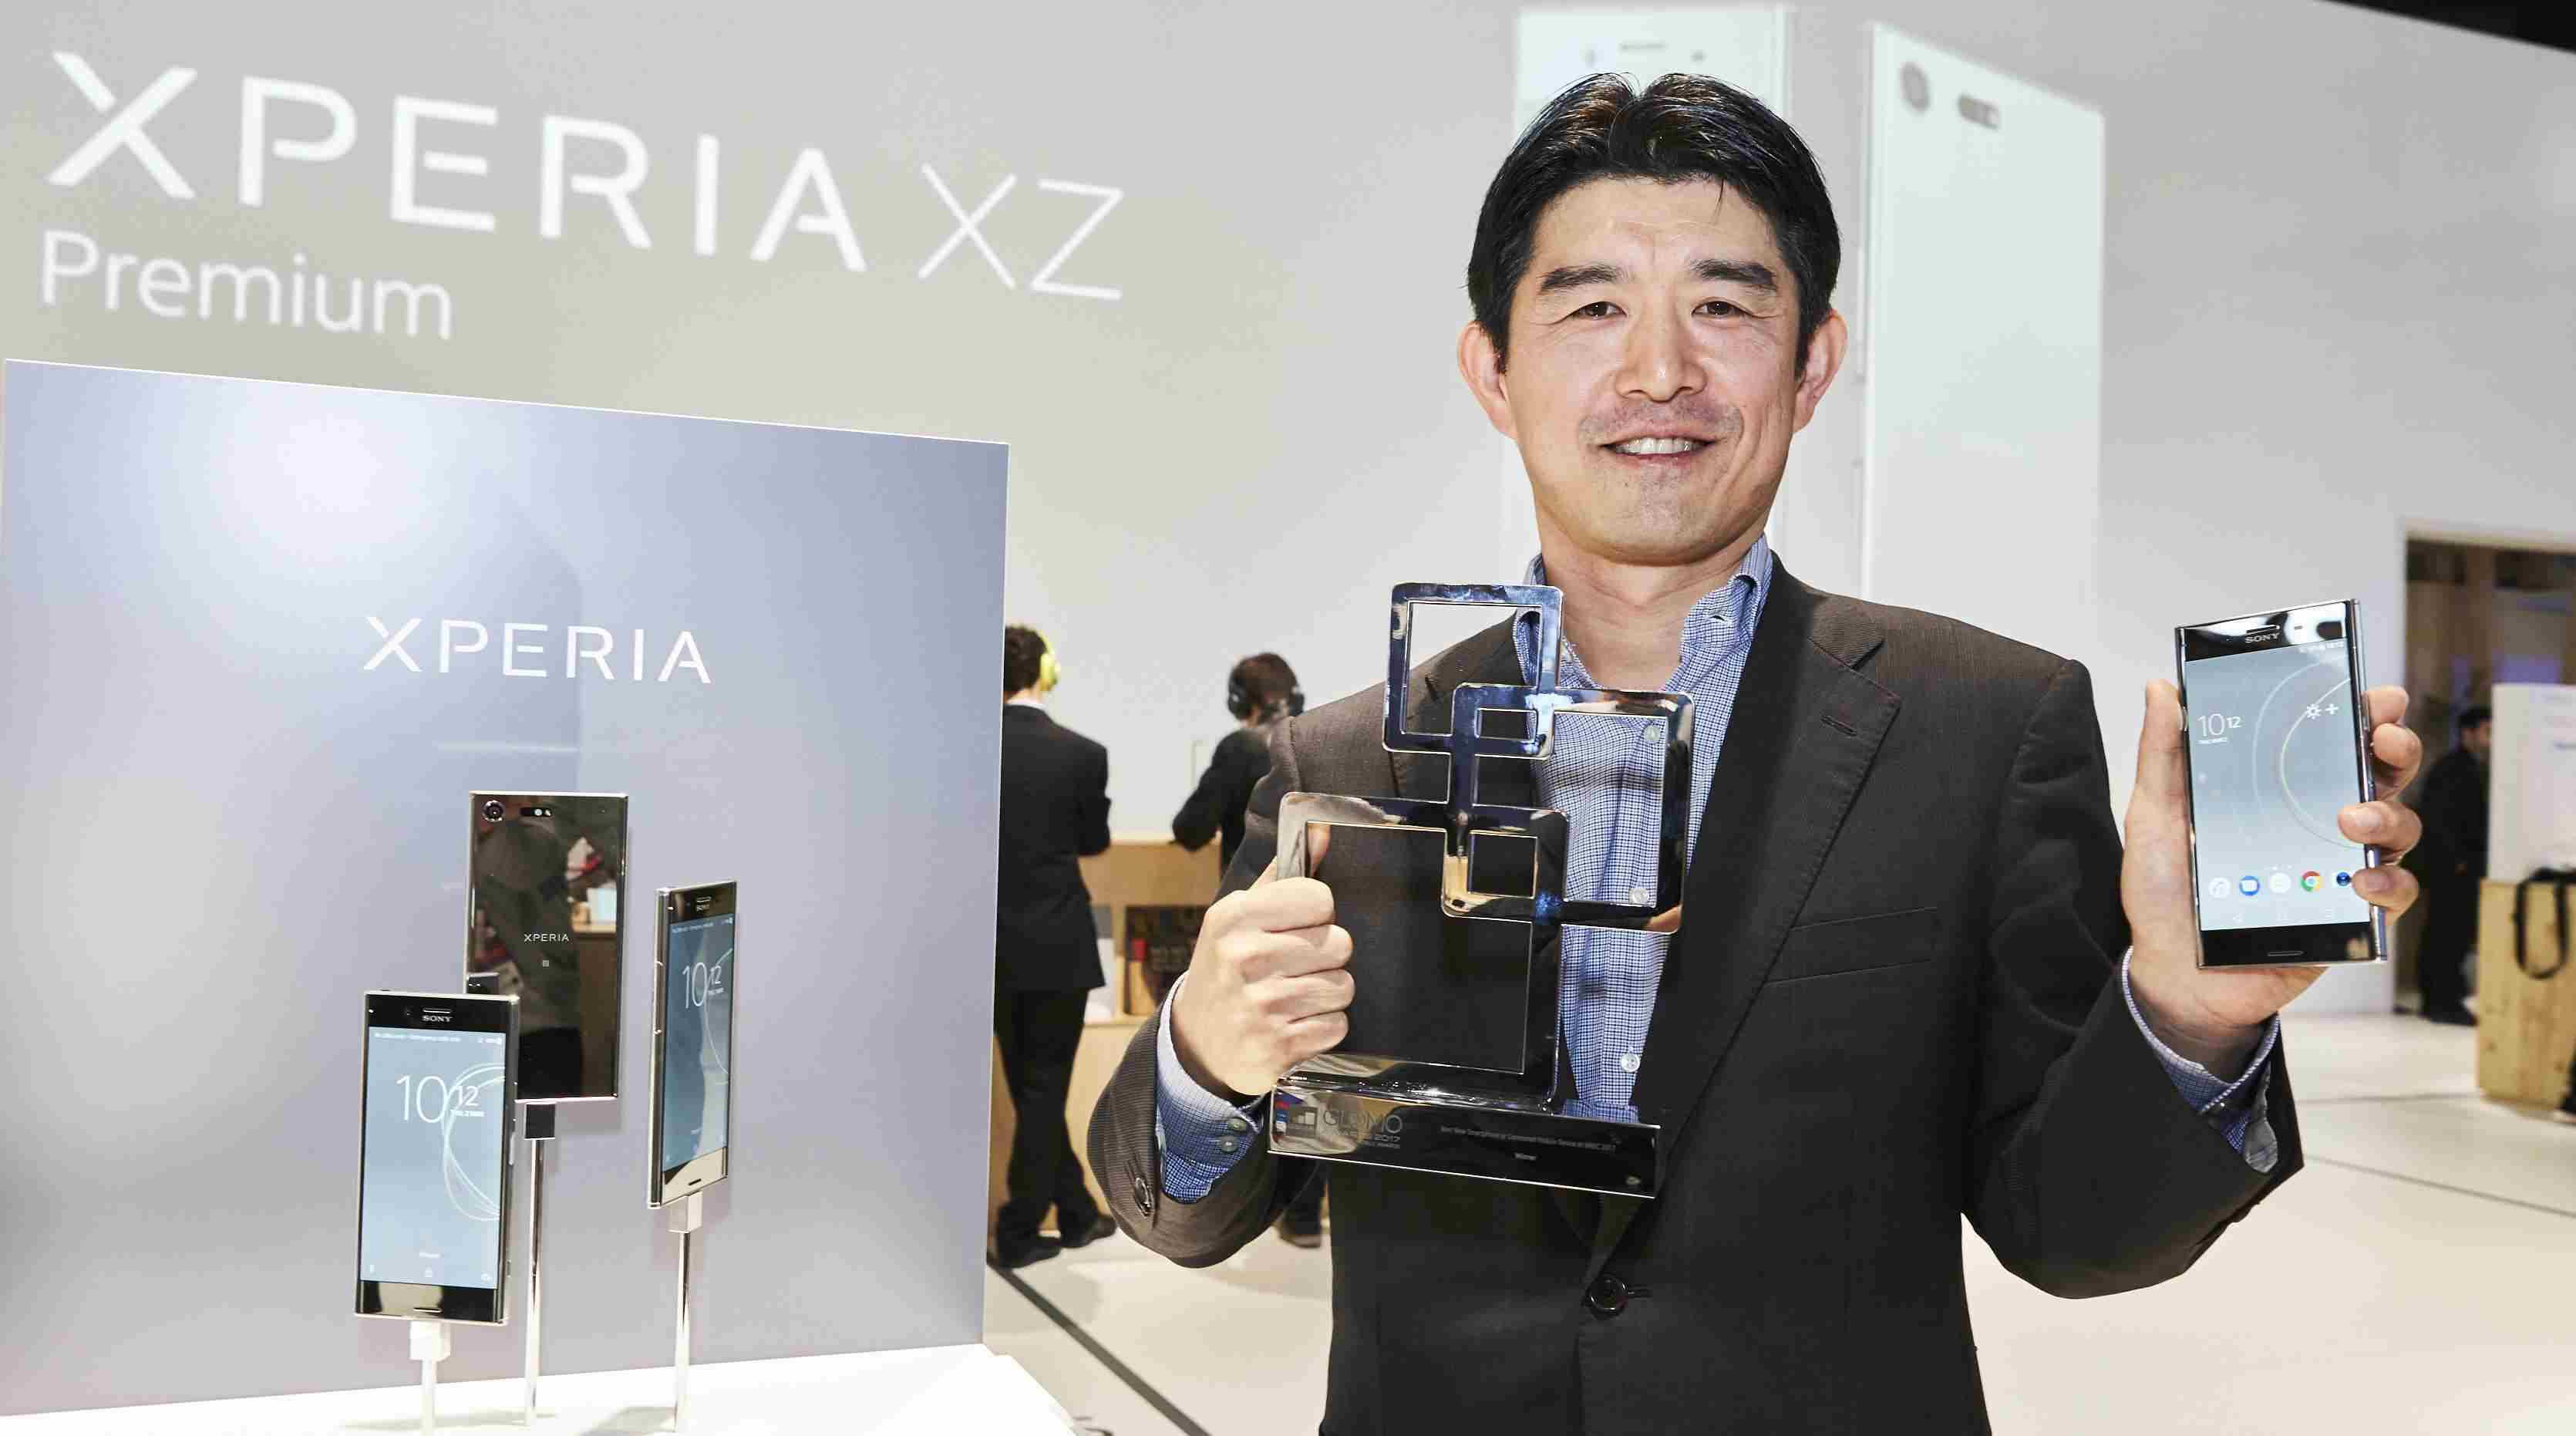 Xperia XZ Premium هو افضل جوال في مؤتمر MWC 2017